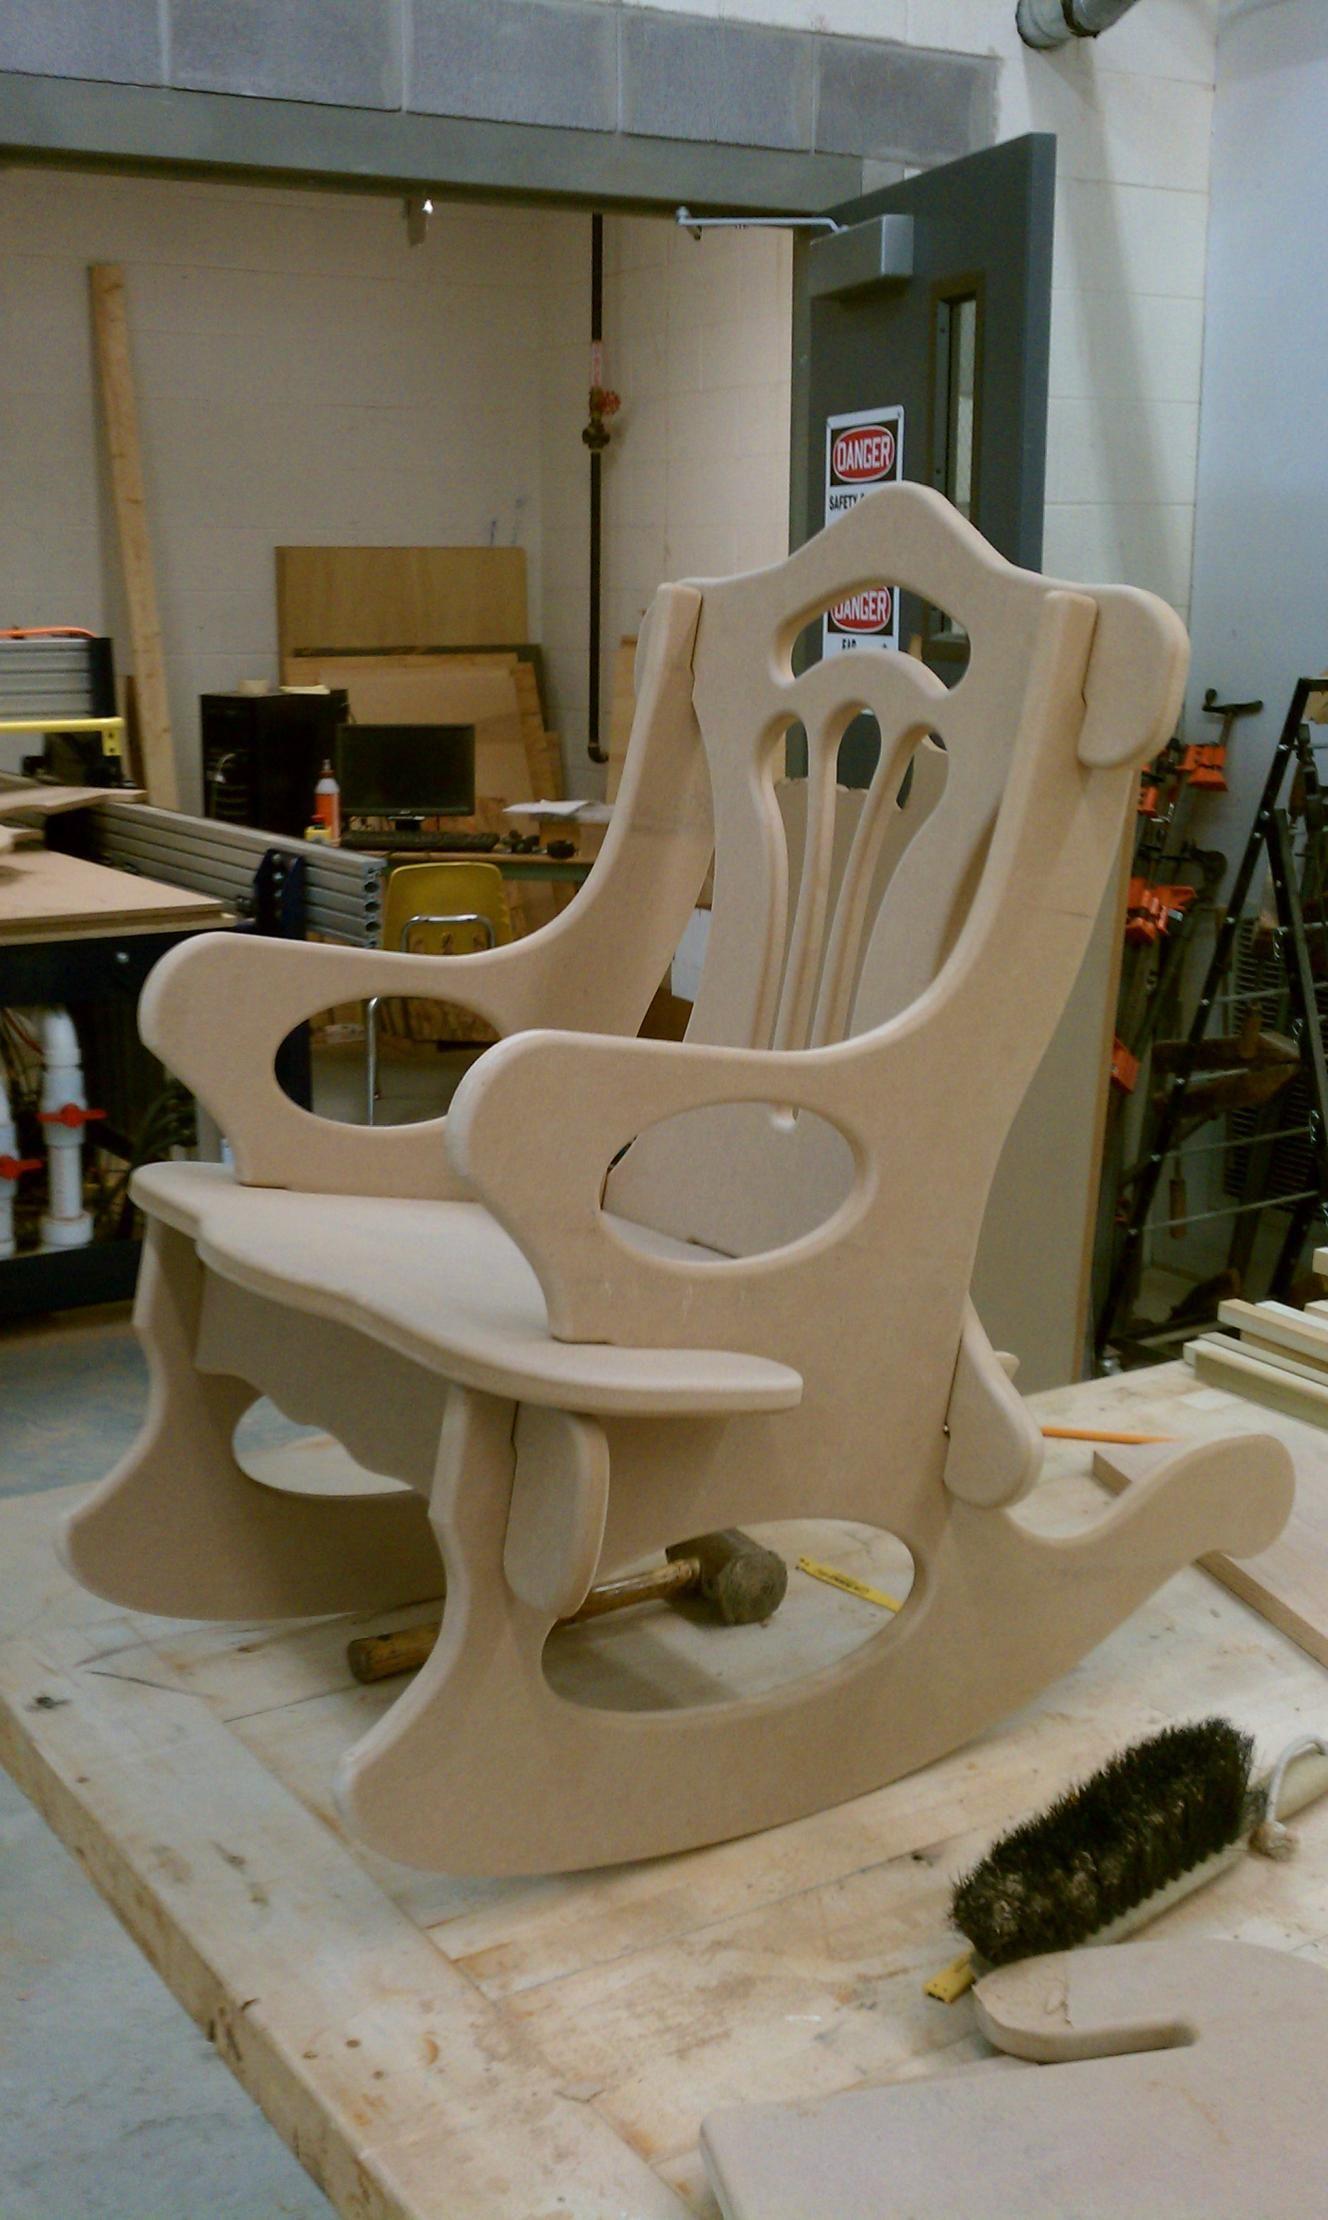 Groovy Attachment Php 1 3282 220 Pixels Craftsmanship Lamtechconsult Wood Chair Design Ideas Lamtechconsultcom